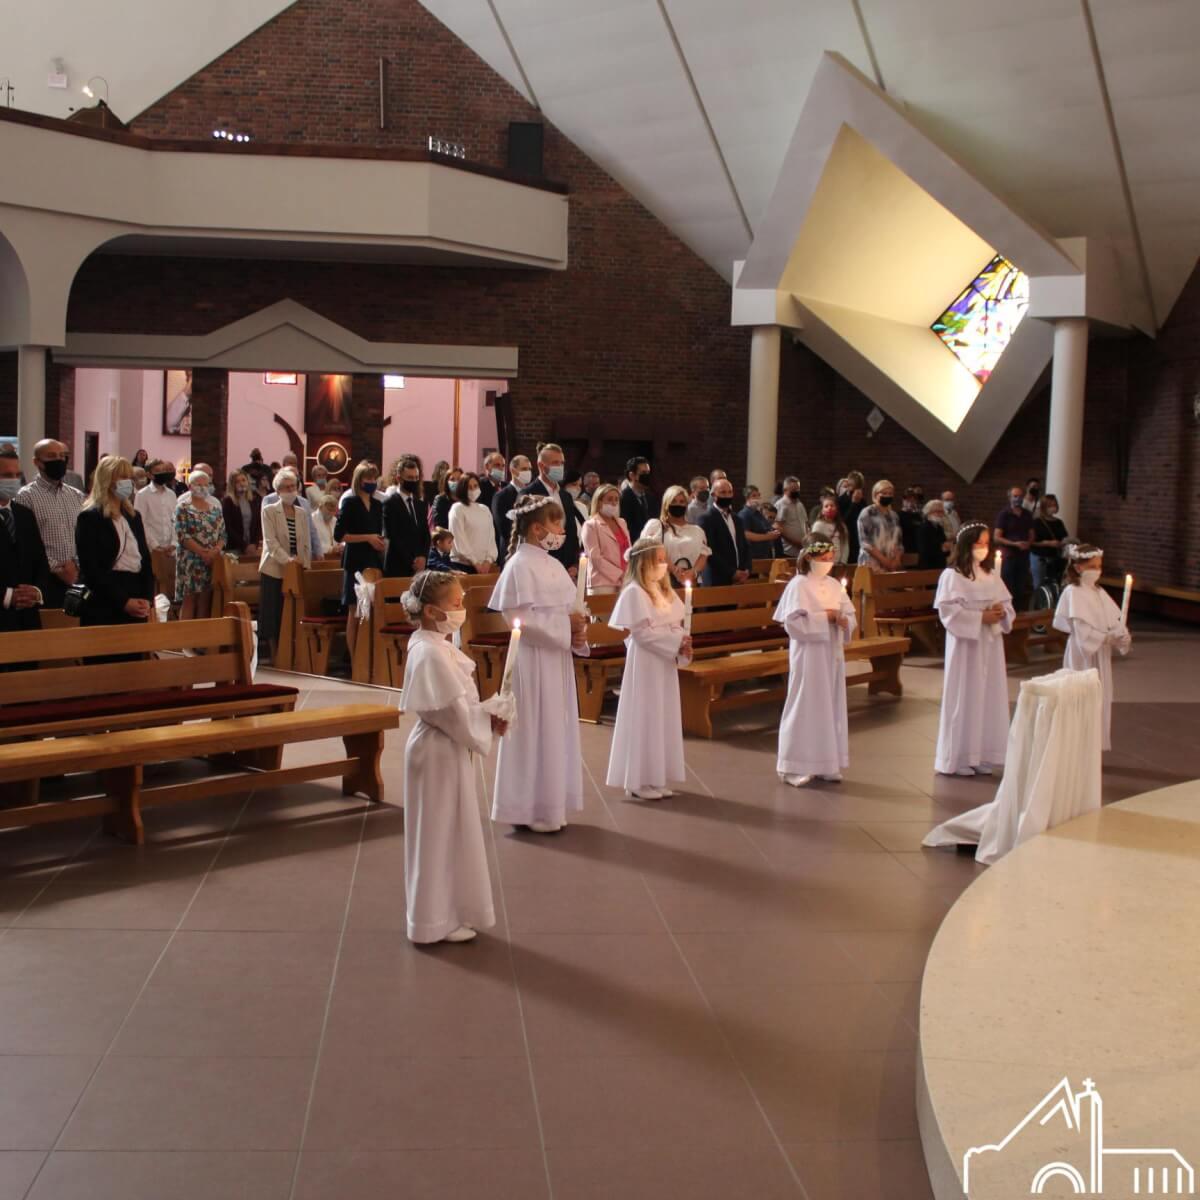 13 IX 2020 – I Komunia św.